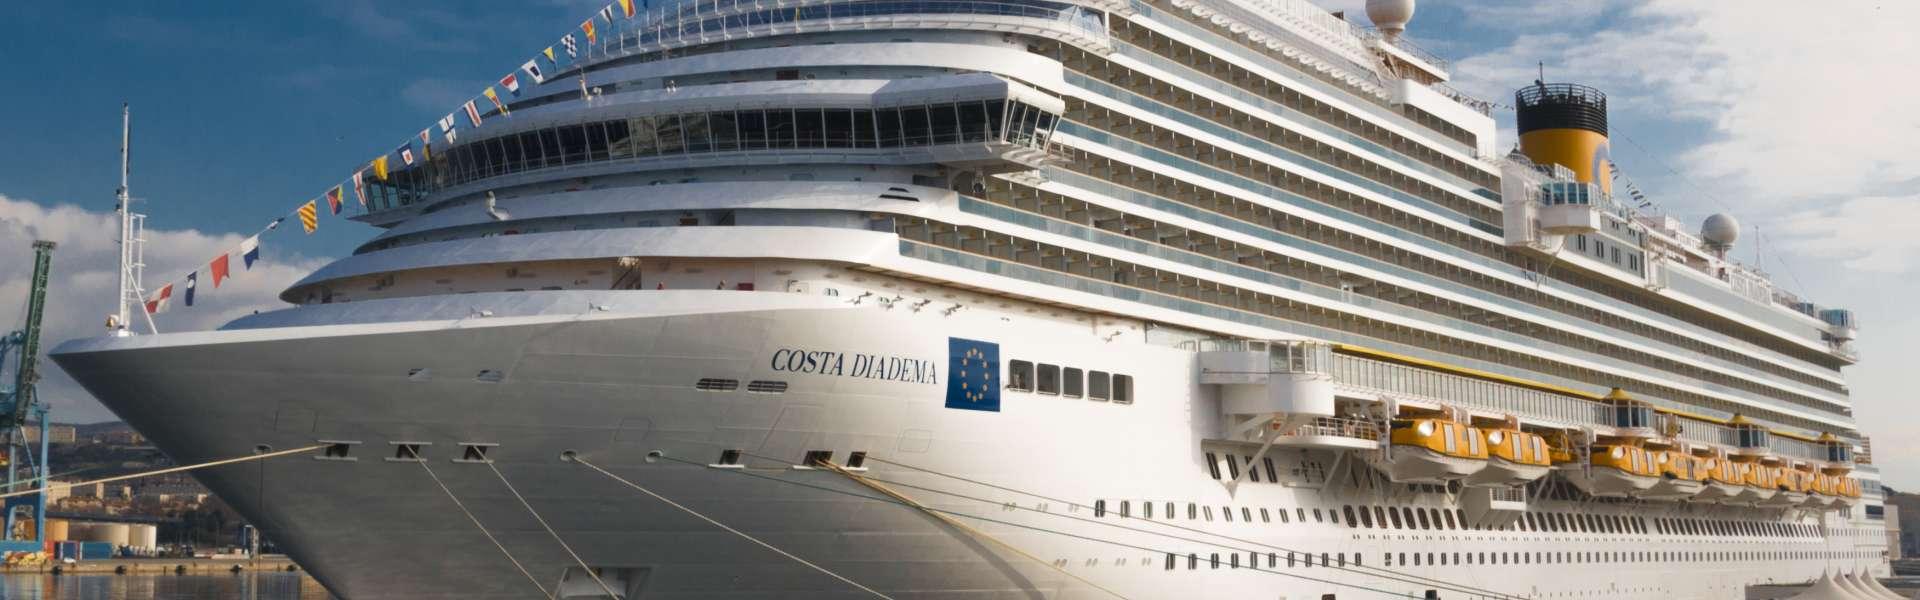 Croaziera 2019 - Mediterana de Vest (Savona) - Costa Cruises - Costa Diadema - 7 nopti